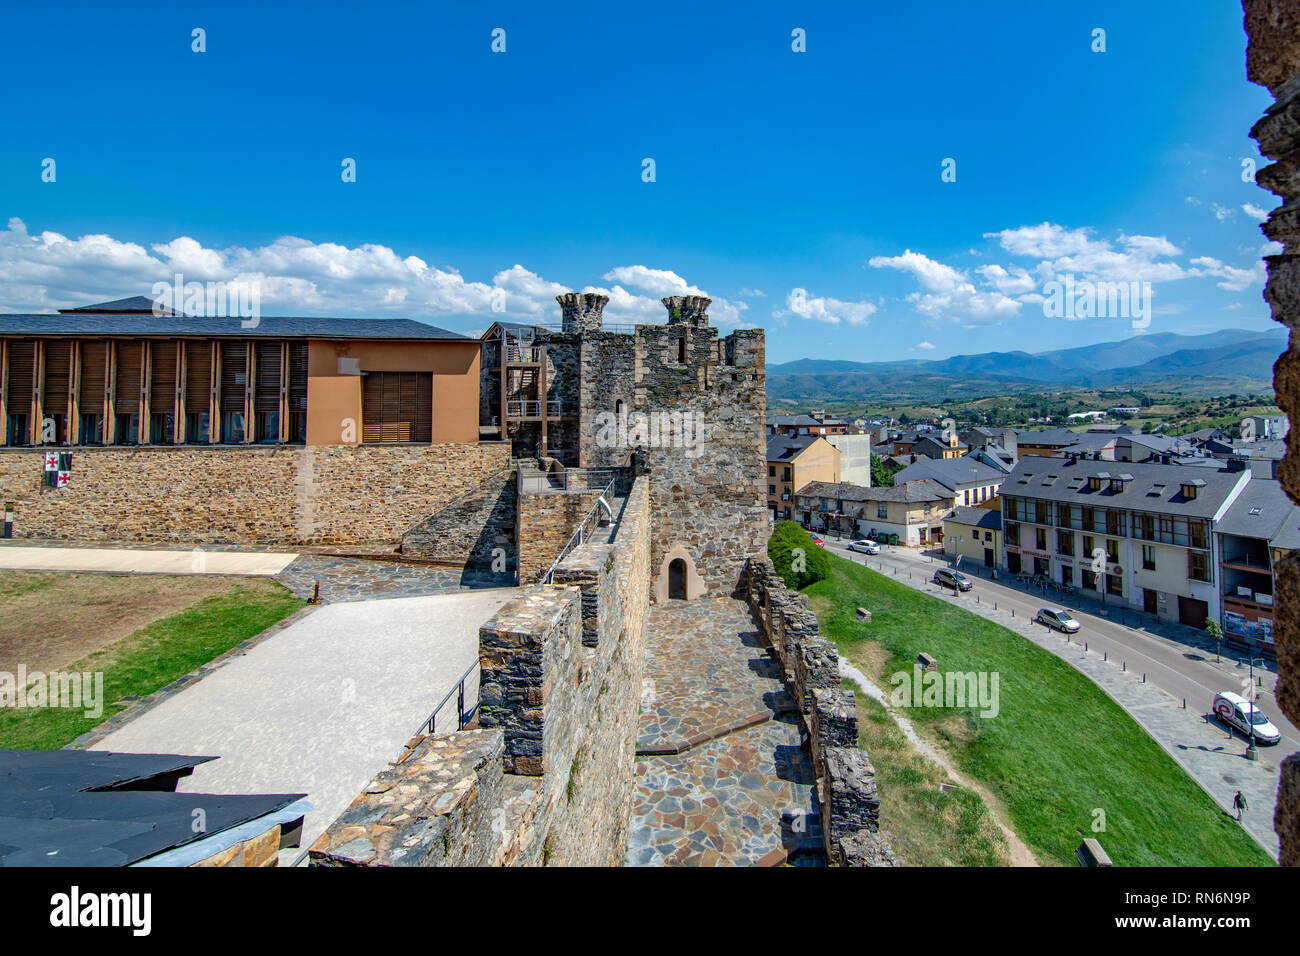 Ponferrada, Leon, Spain; June 2017: view of the Wall of Templar Castle in the  city of Ponferrada province of Leon - Stock Image